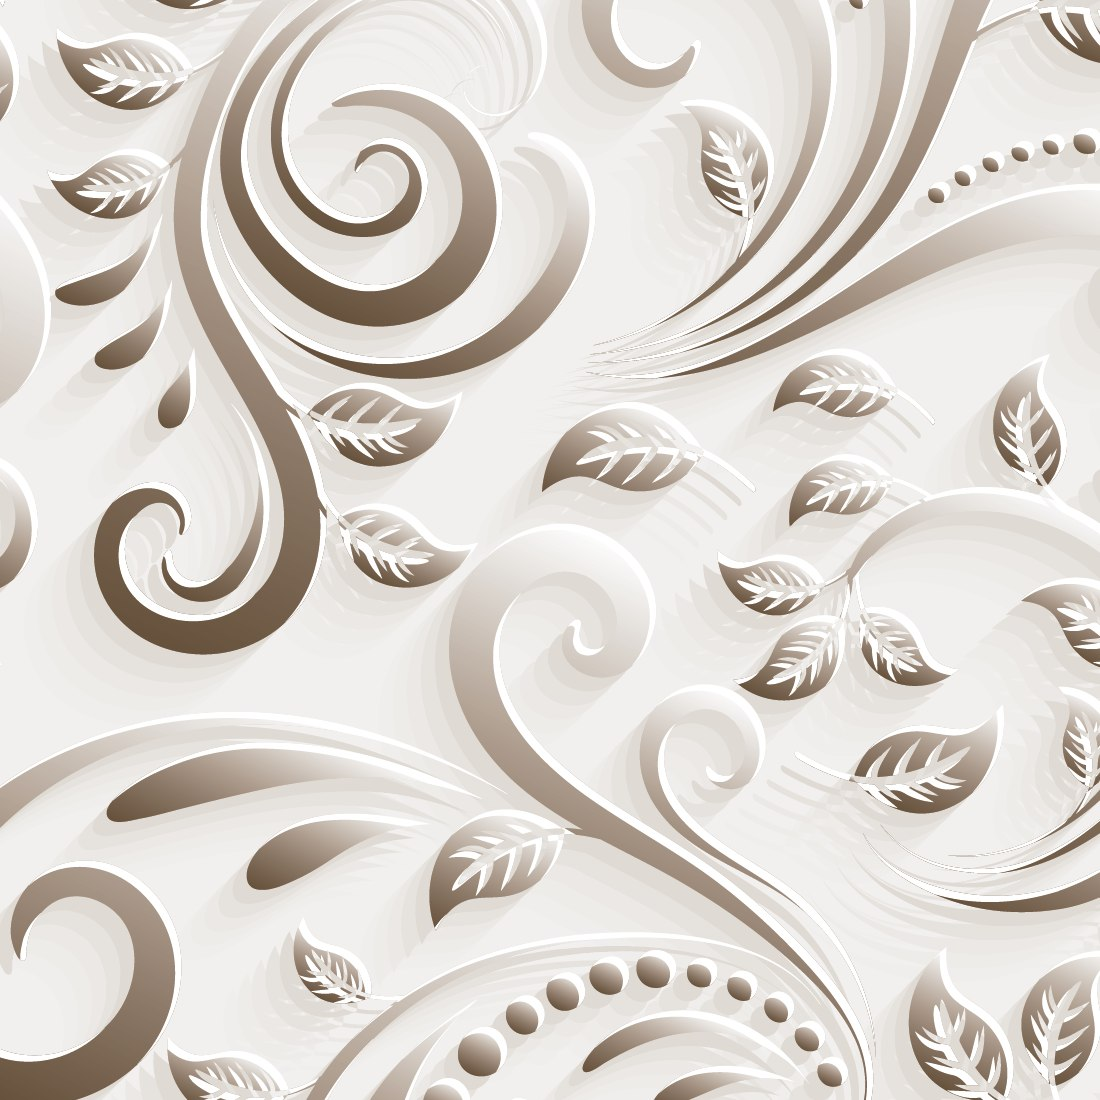 Papel de parede floral efeito 3d v rias cores auto adesivo - Paredes de papel ...